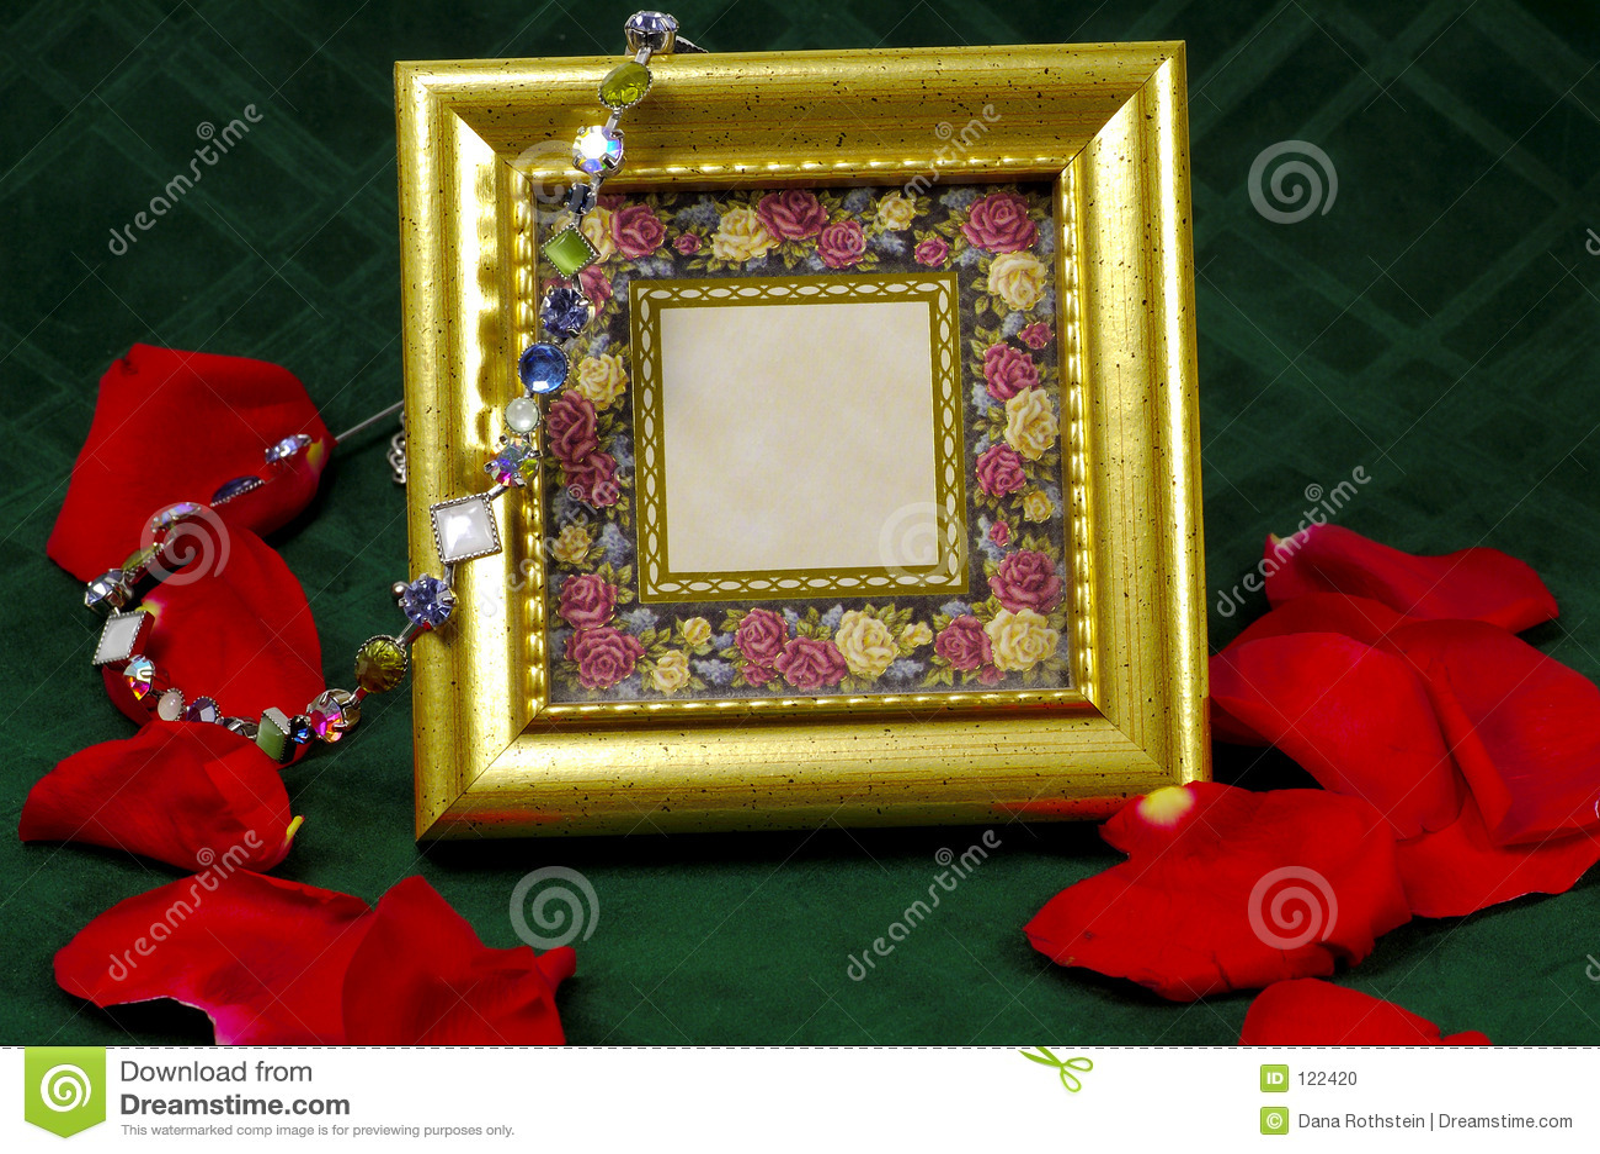 gold frame rose petals - photo #4